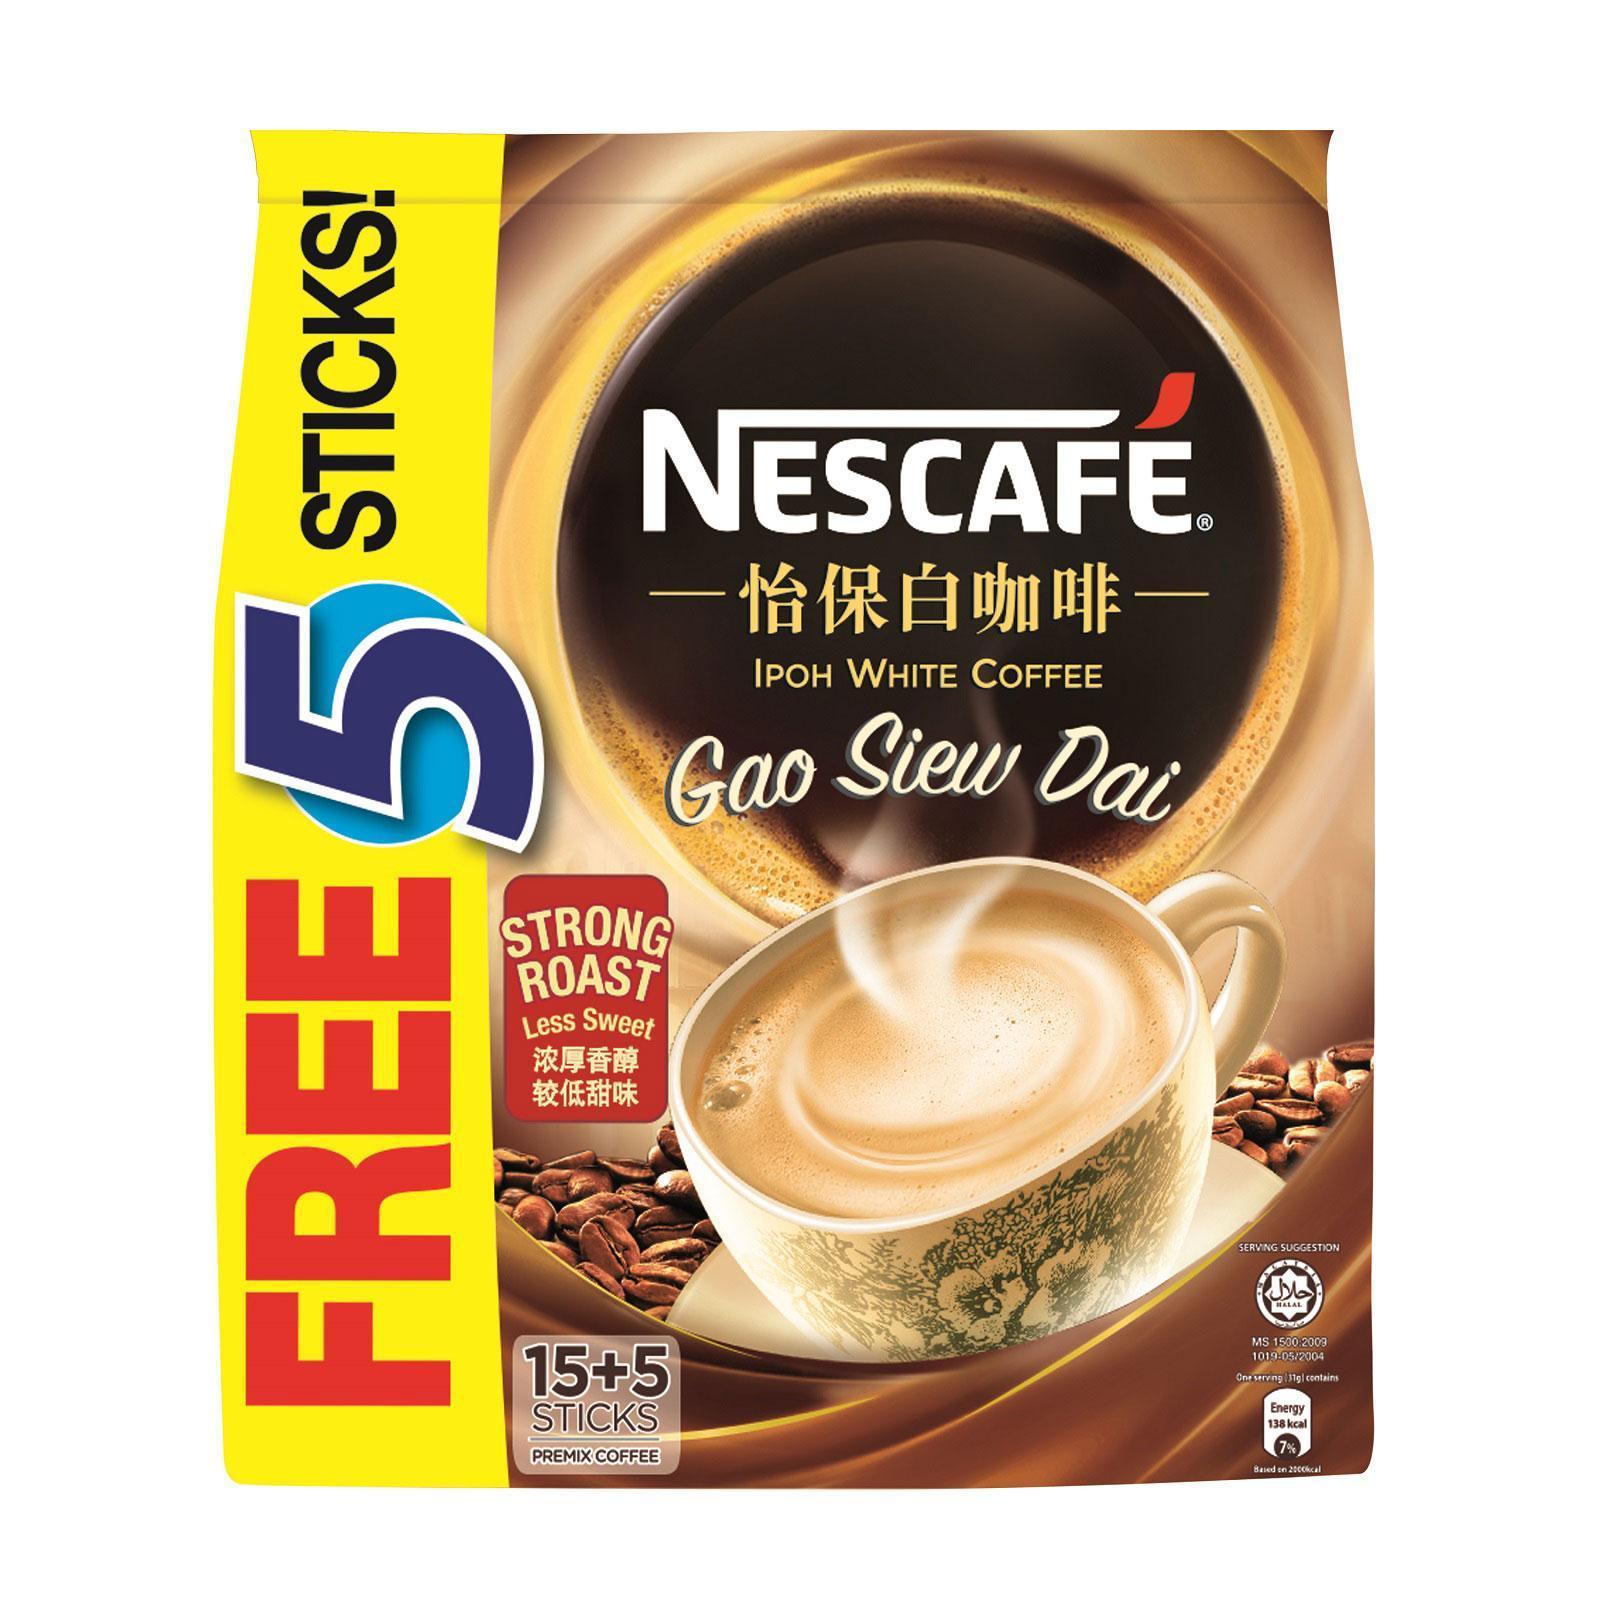 NESCAFE Ipoh White Coffee Gao Siew Dai 15S + Free 5S